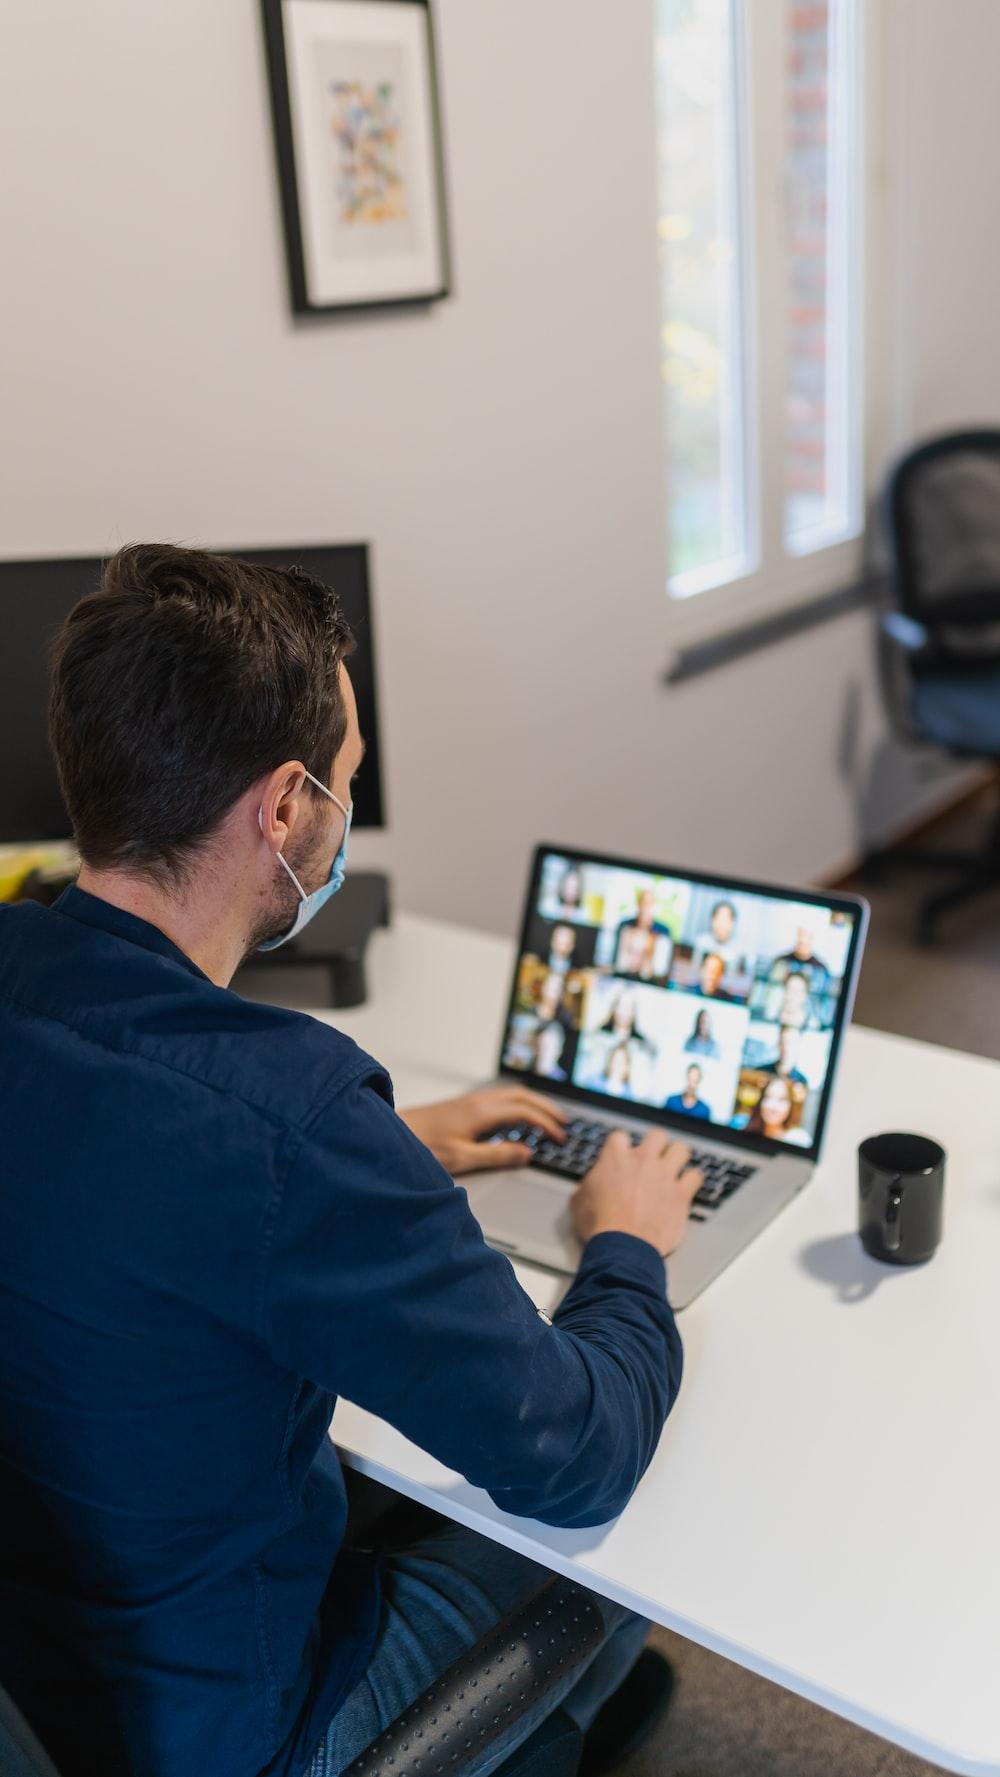 man in blue long sleeve shirt using black laptop computer